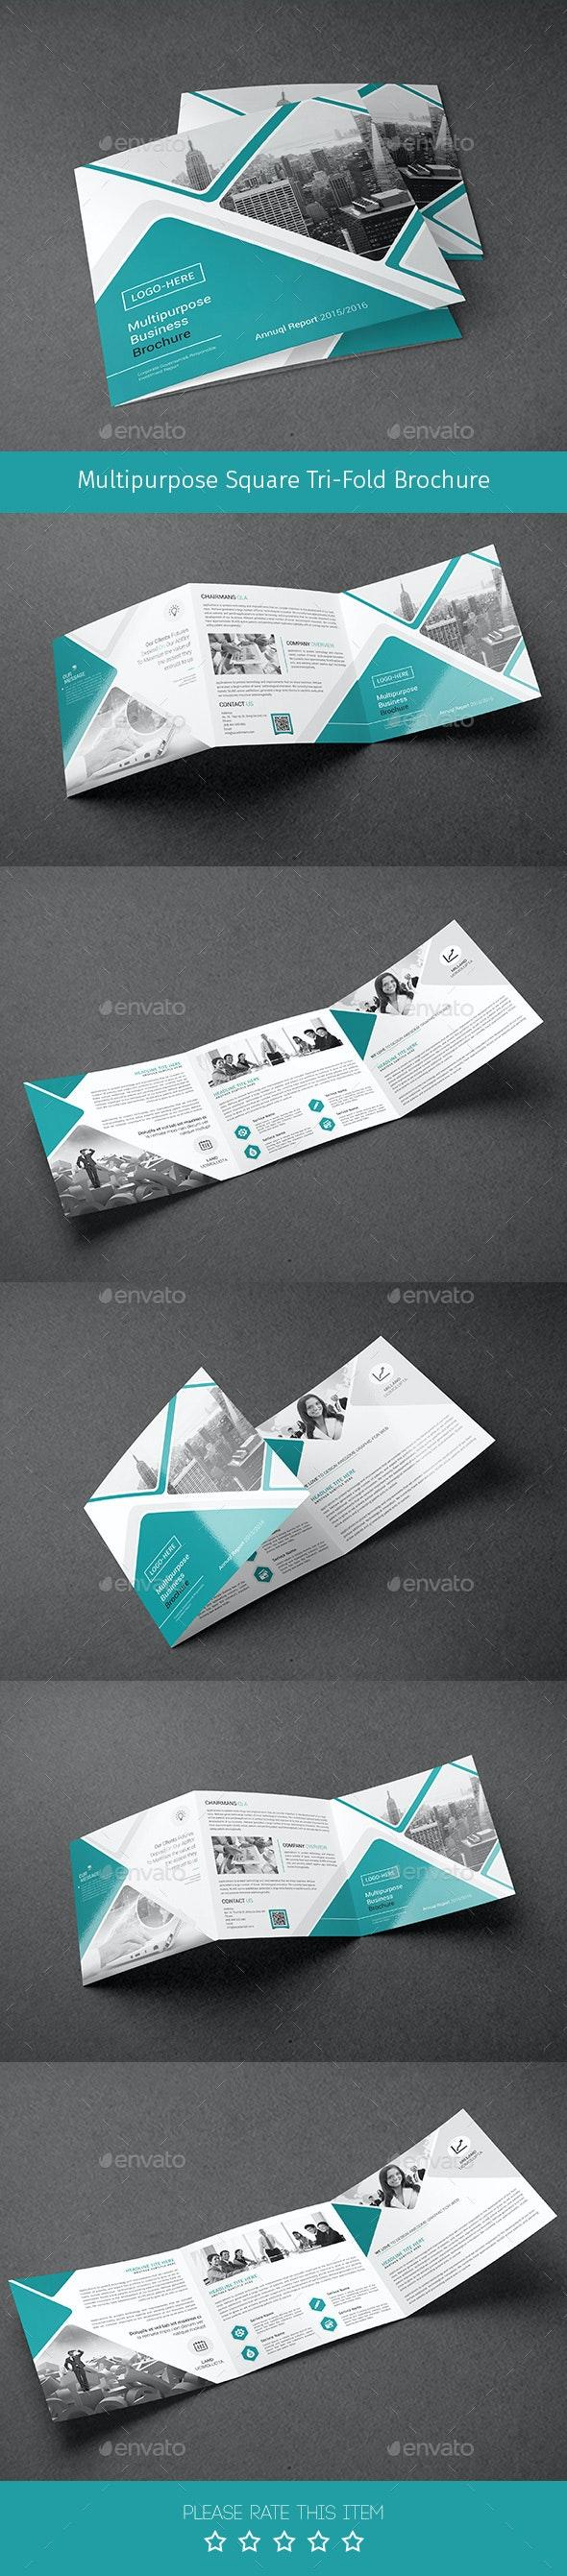 Corporate Tri-fold Square Brochure 02 - Corporate Brochures